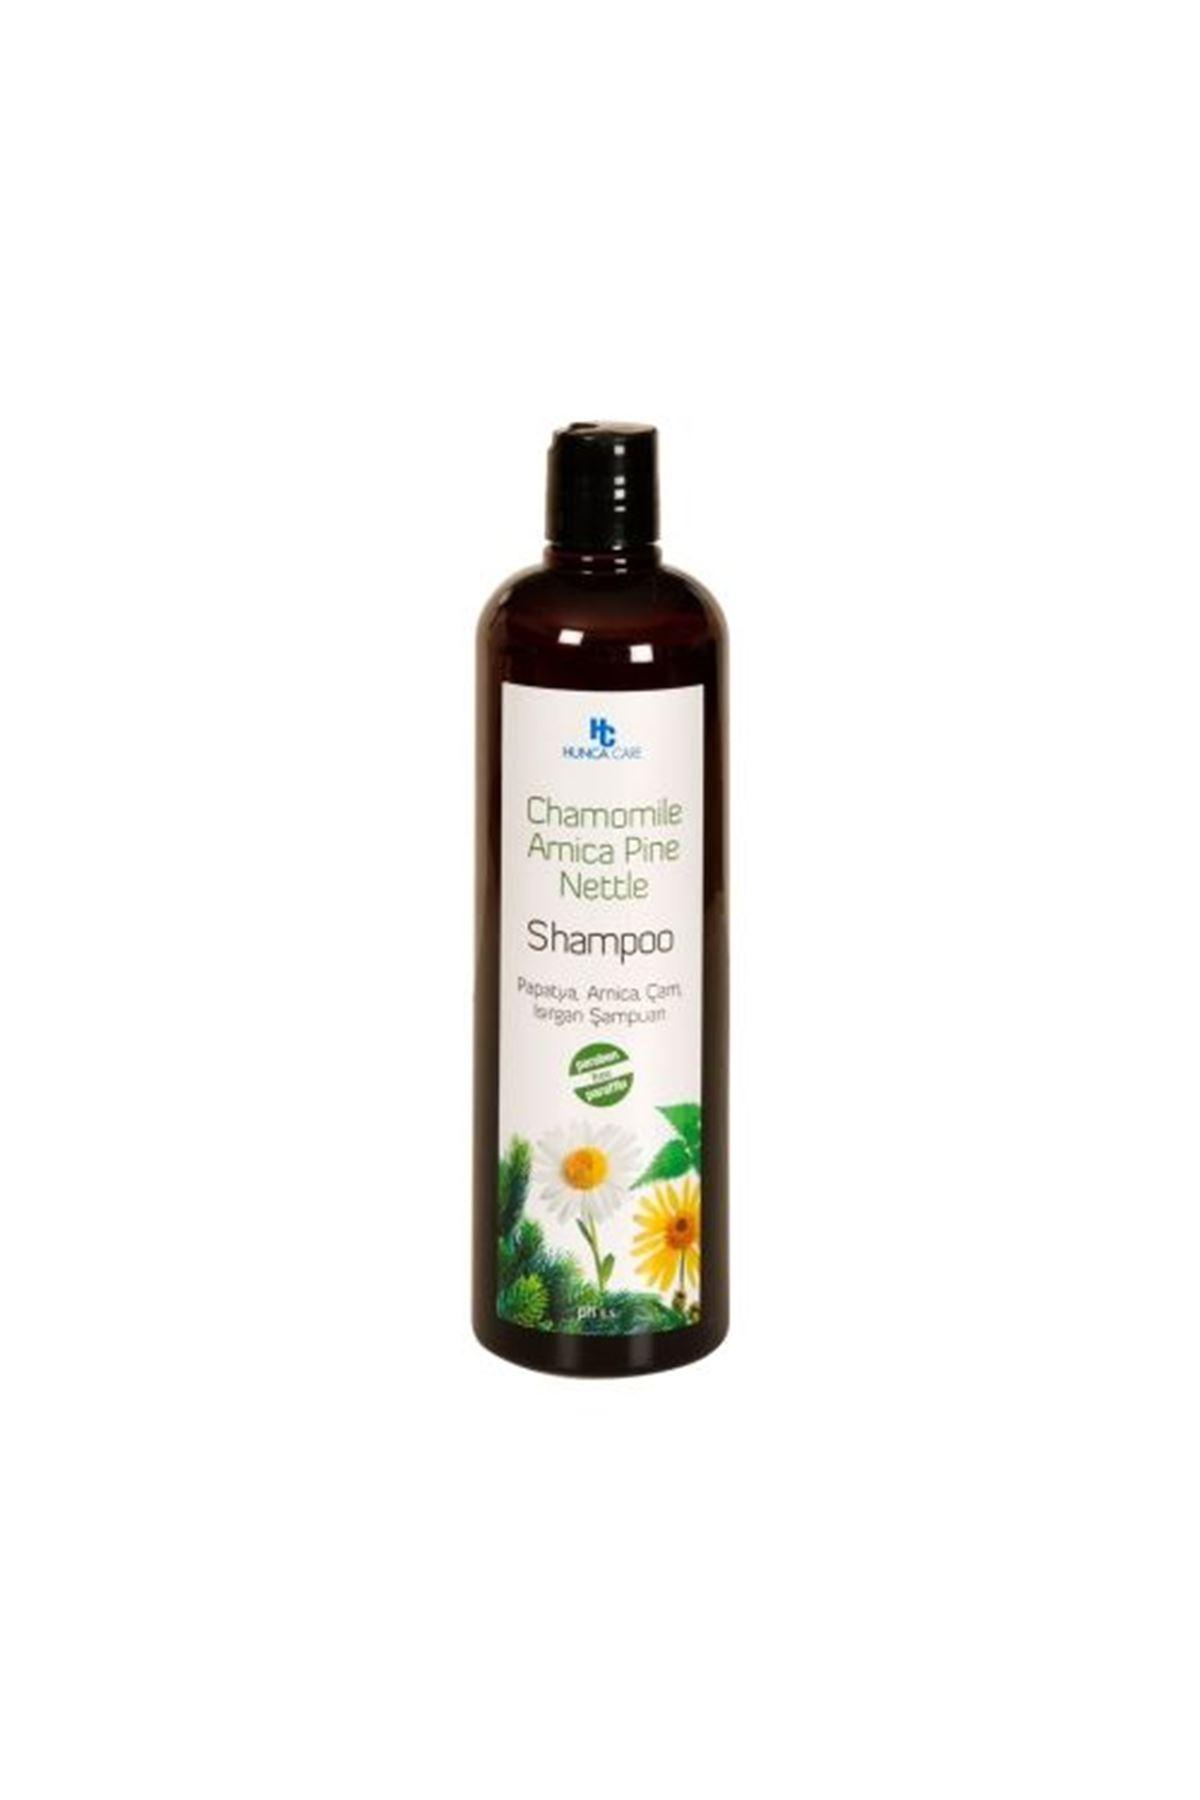 HUNCA CARE Bitkisel Kompleks Şampuan  700GR